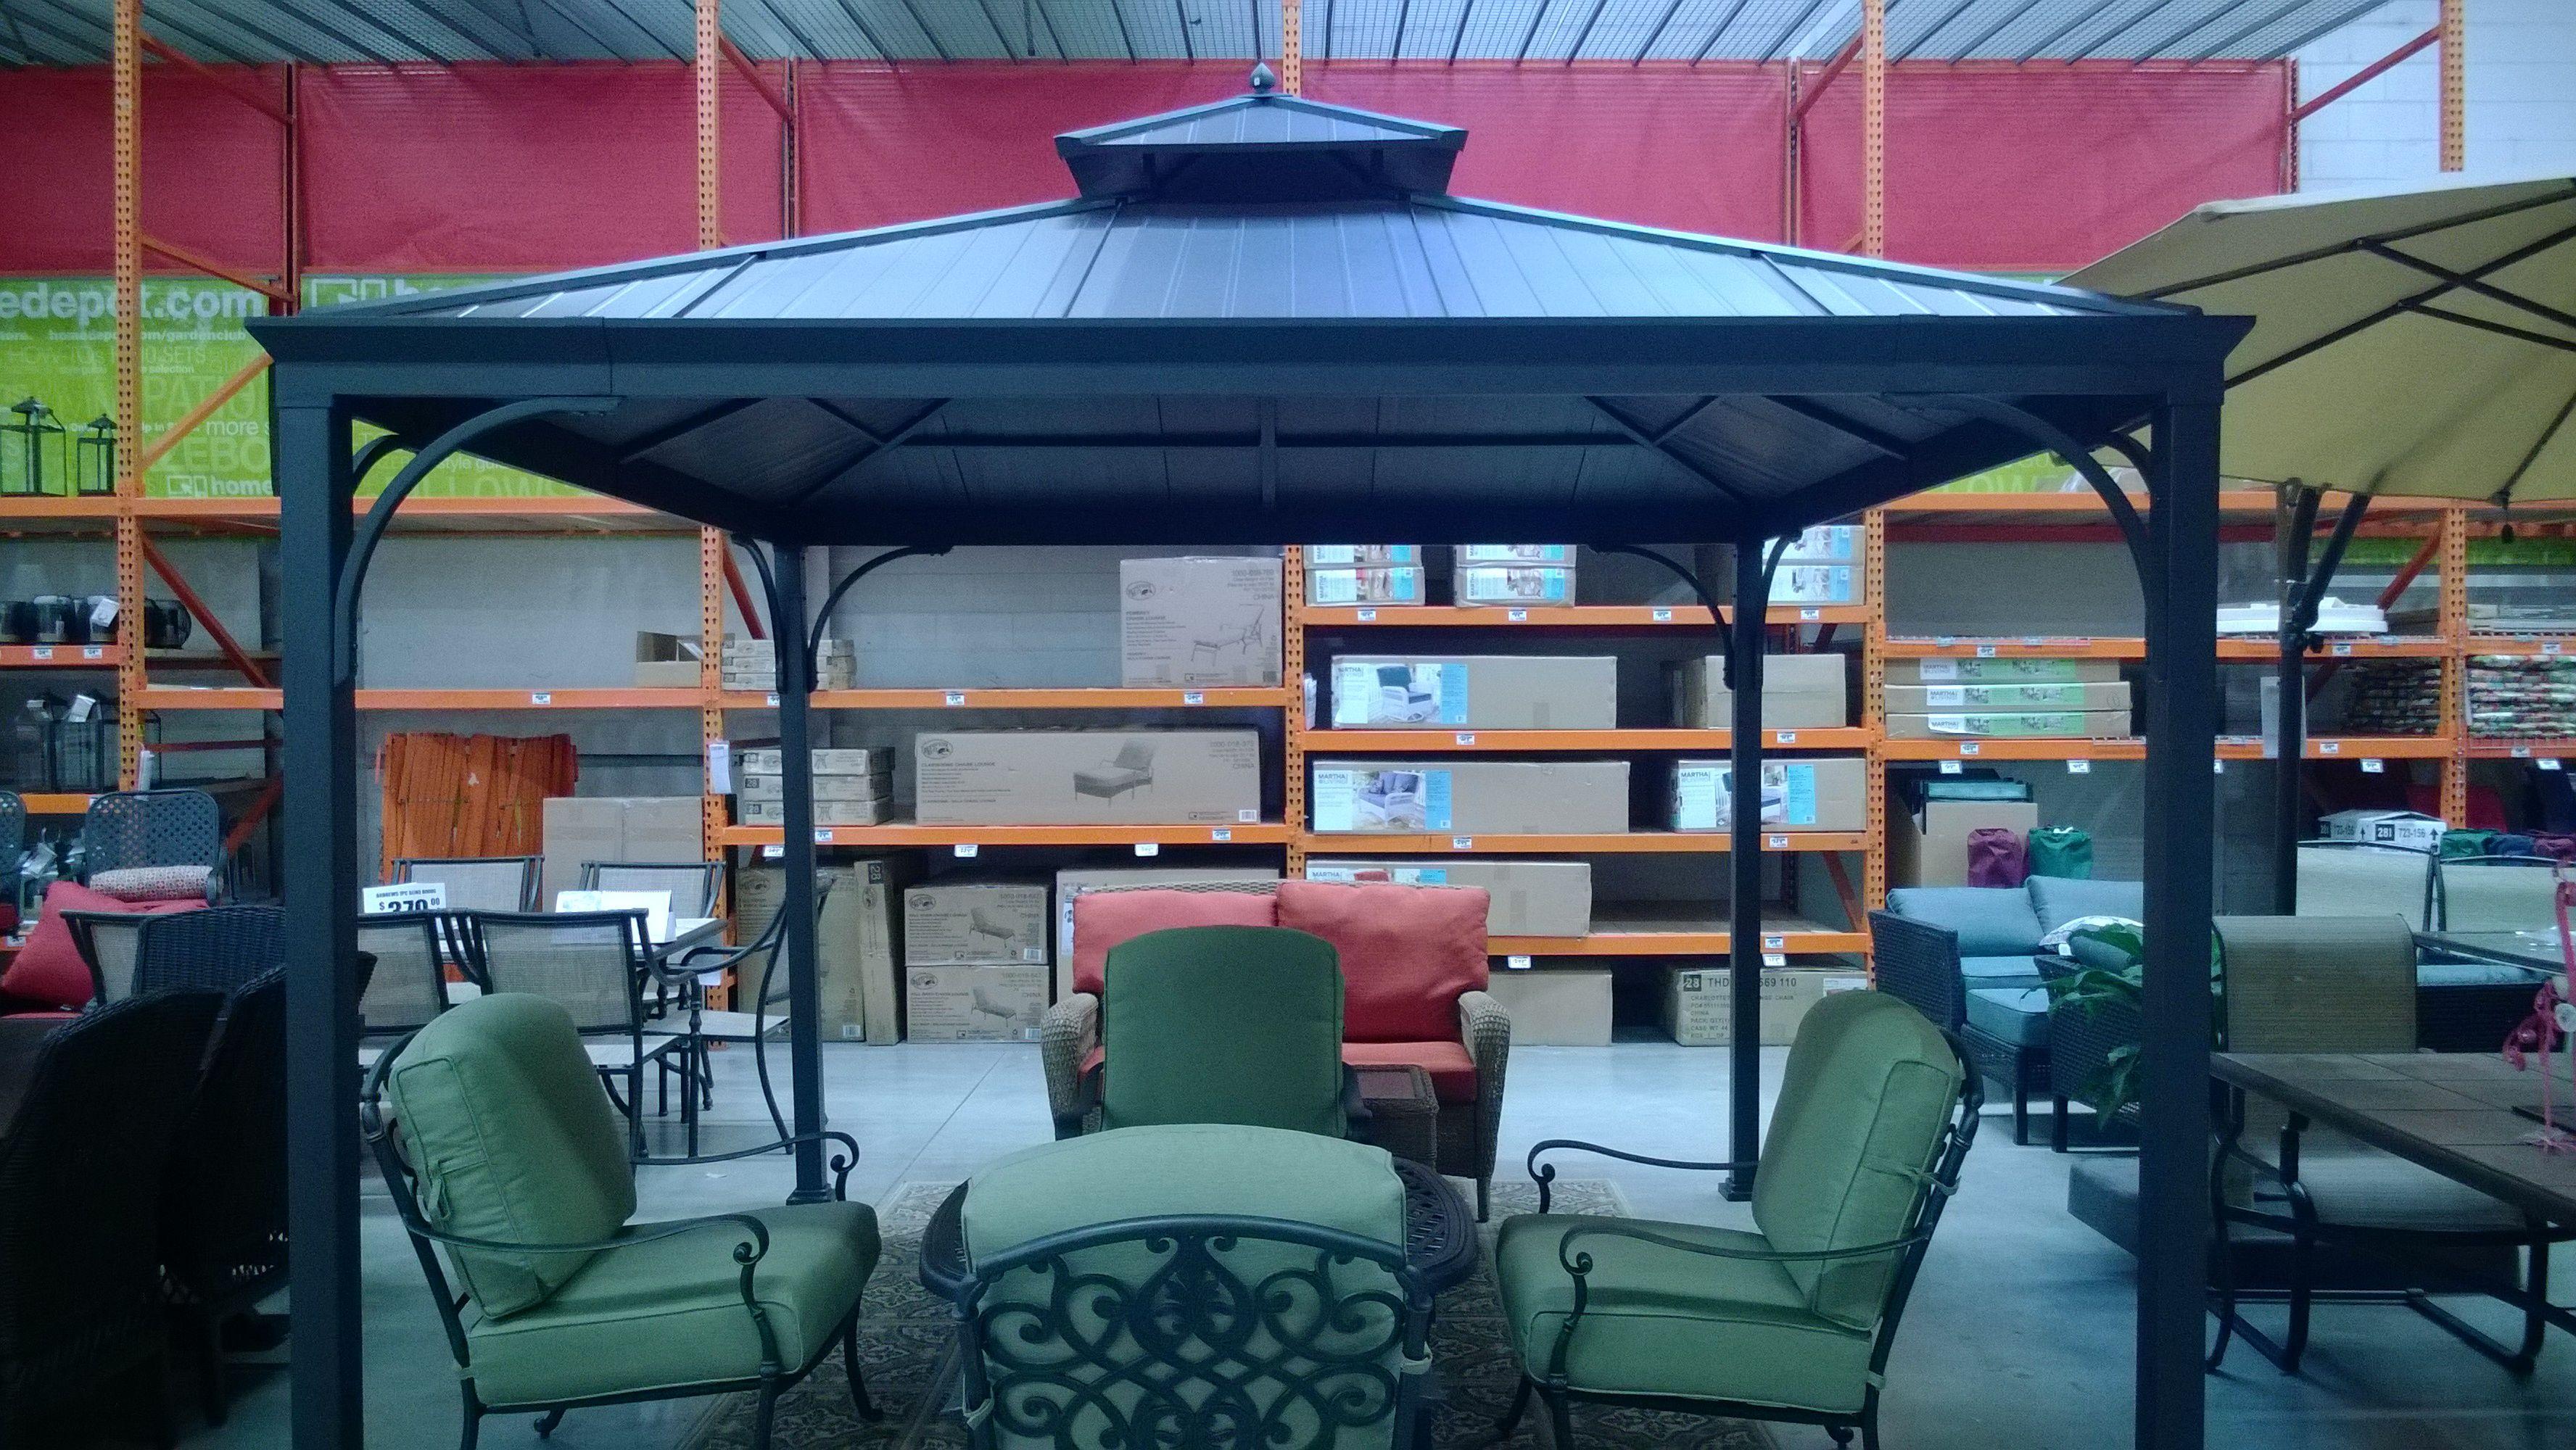 10x10 Metal Roof Gazebo Assembled. Hampton Bay Harper Assembly And Installation